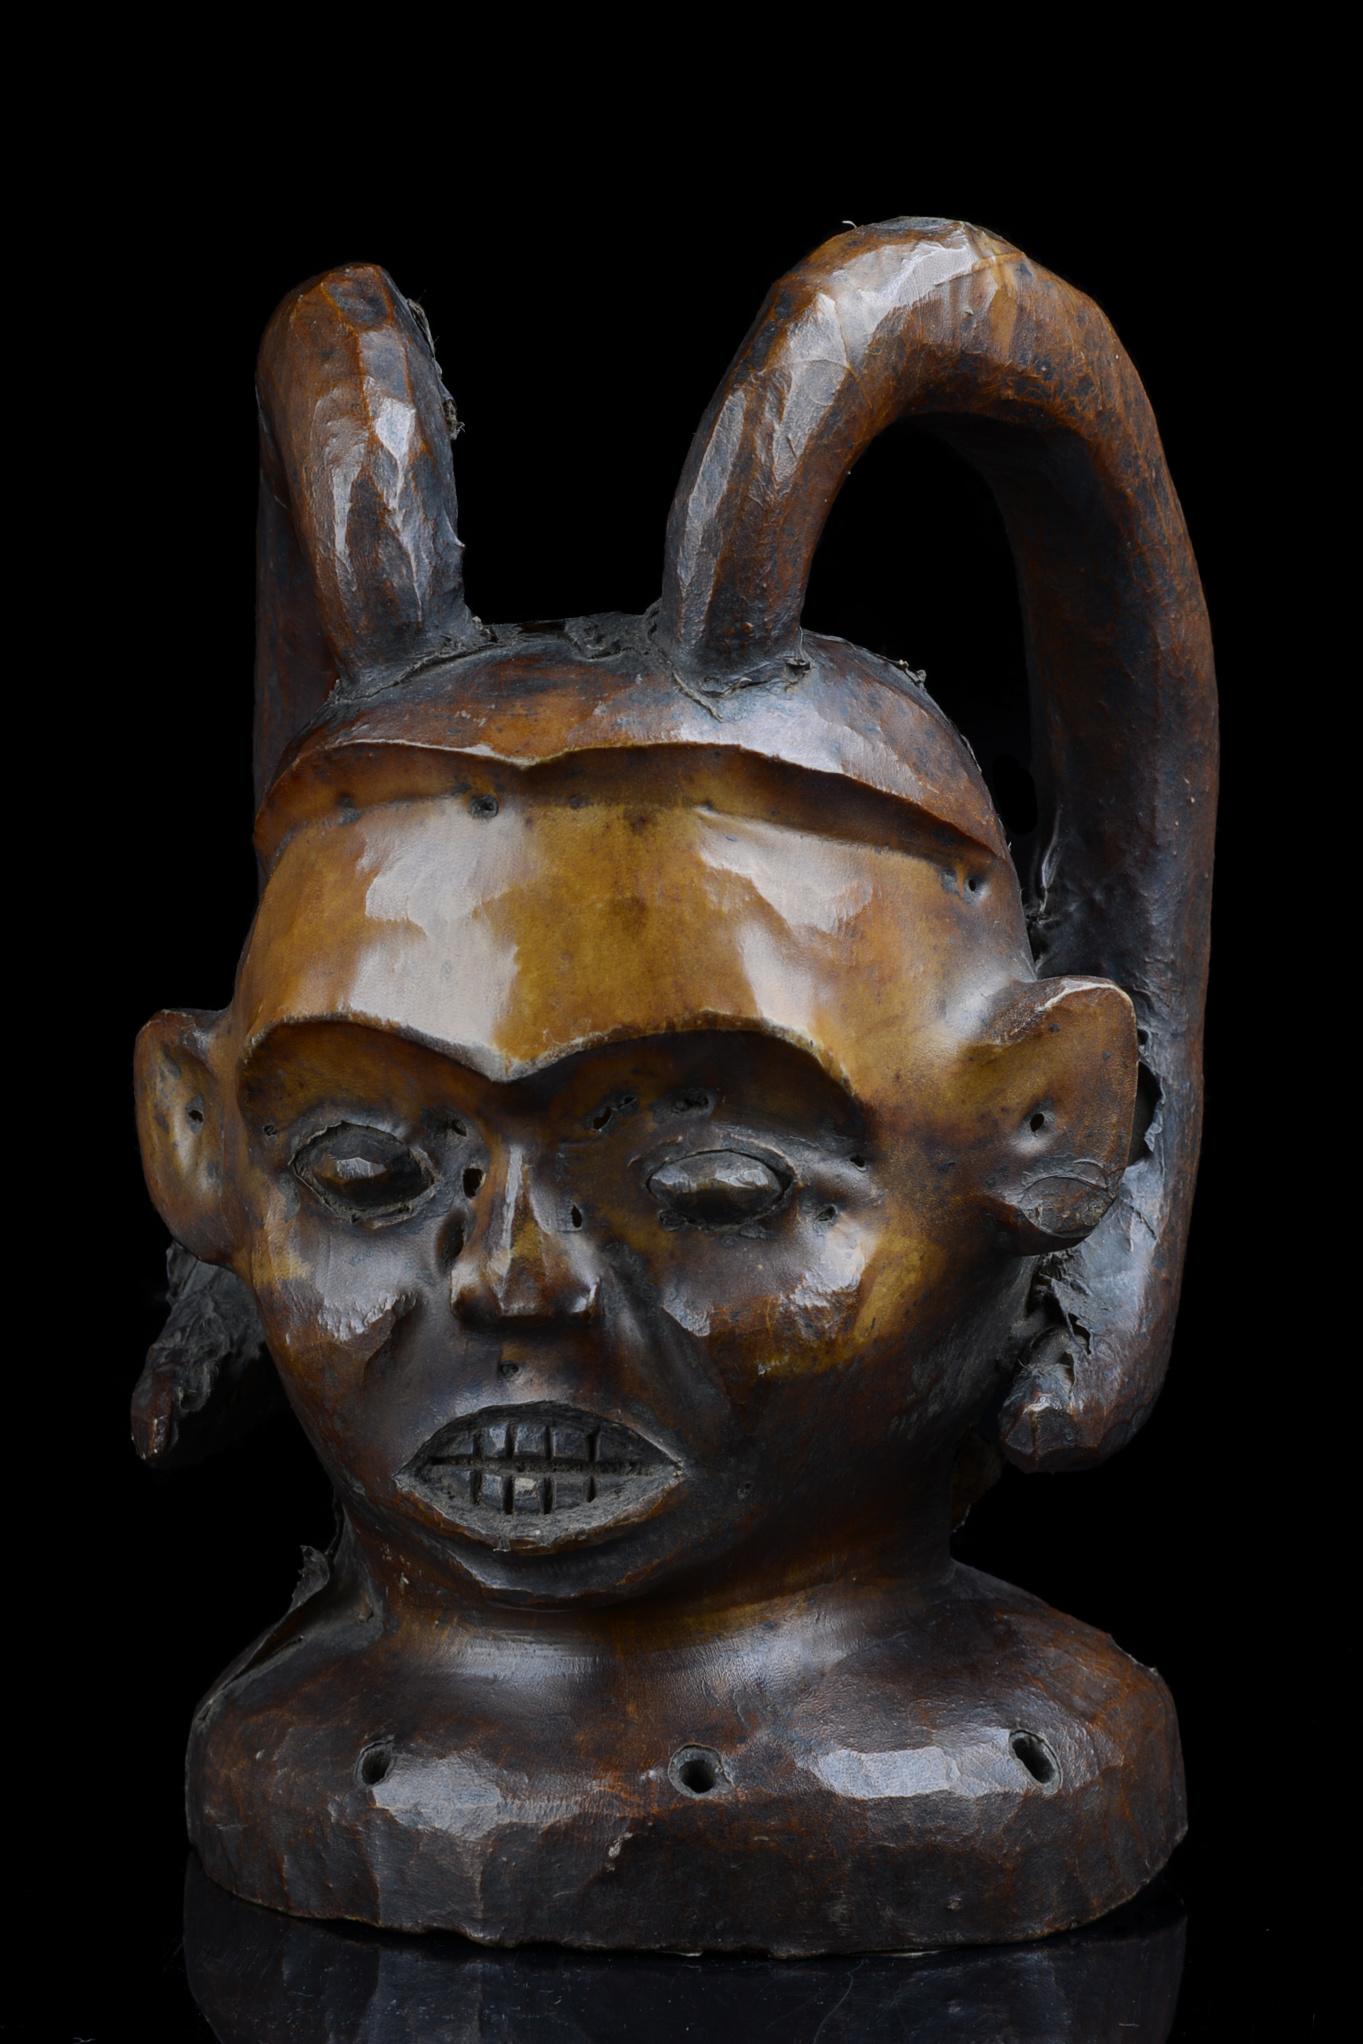 Anthropomorphic dance crest with horns